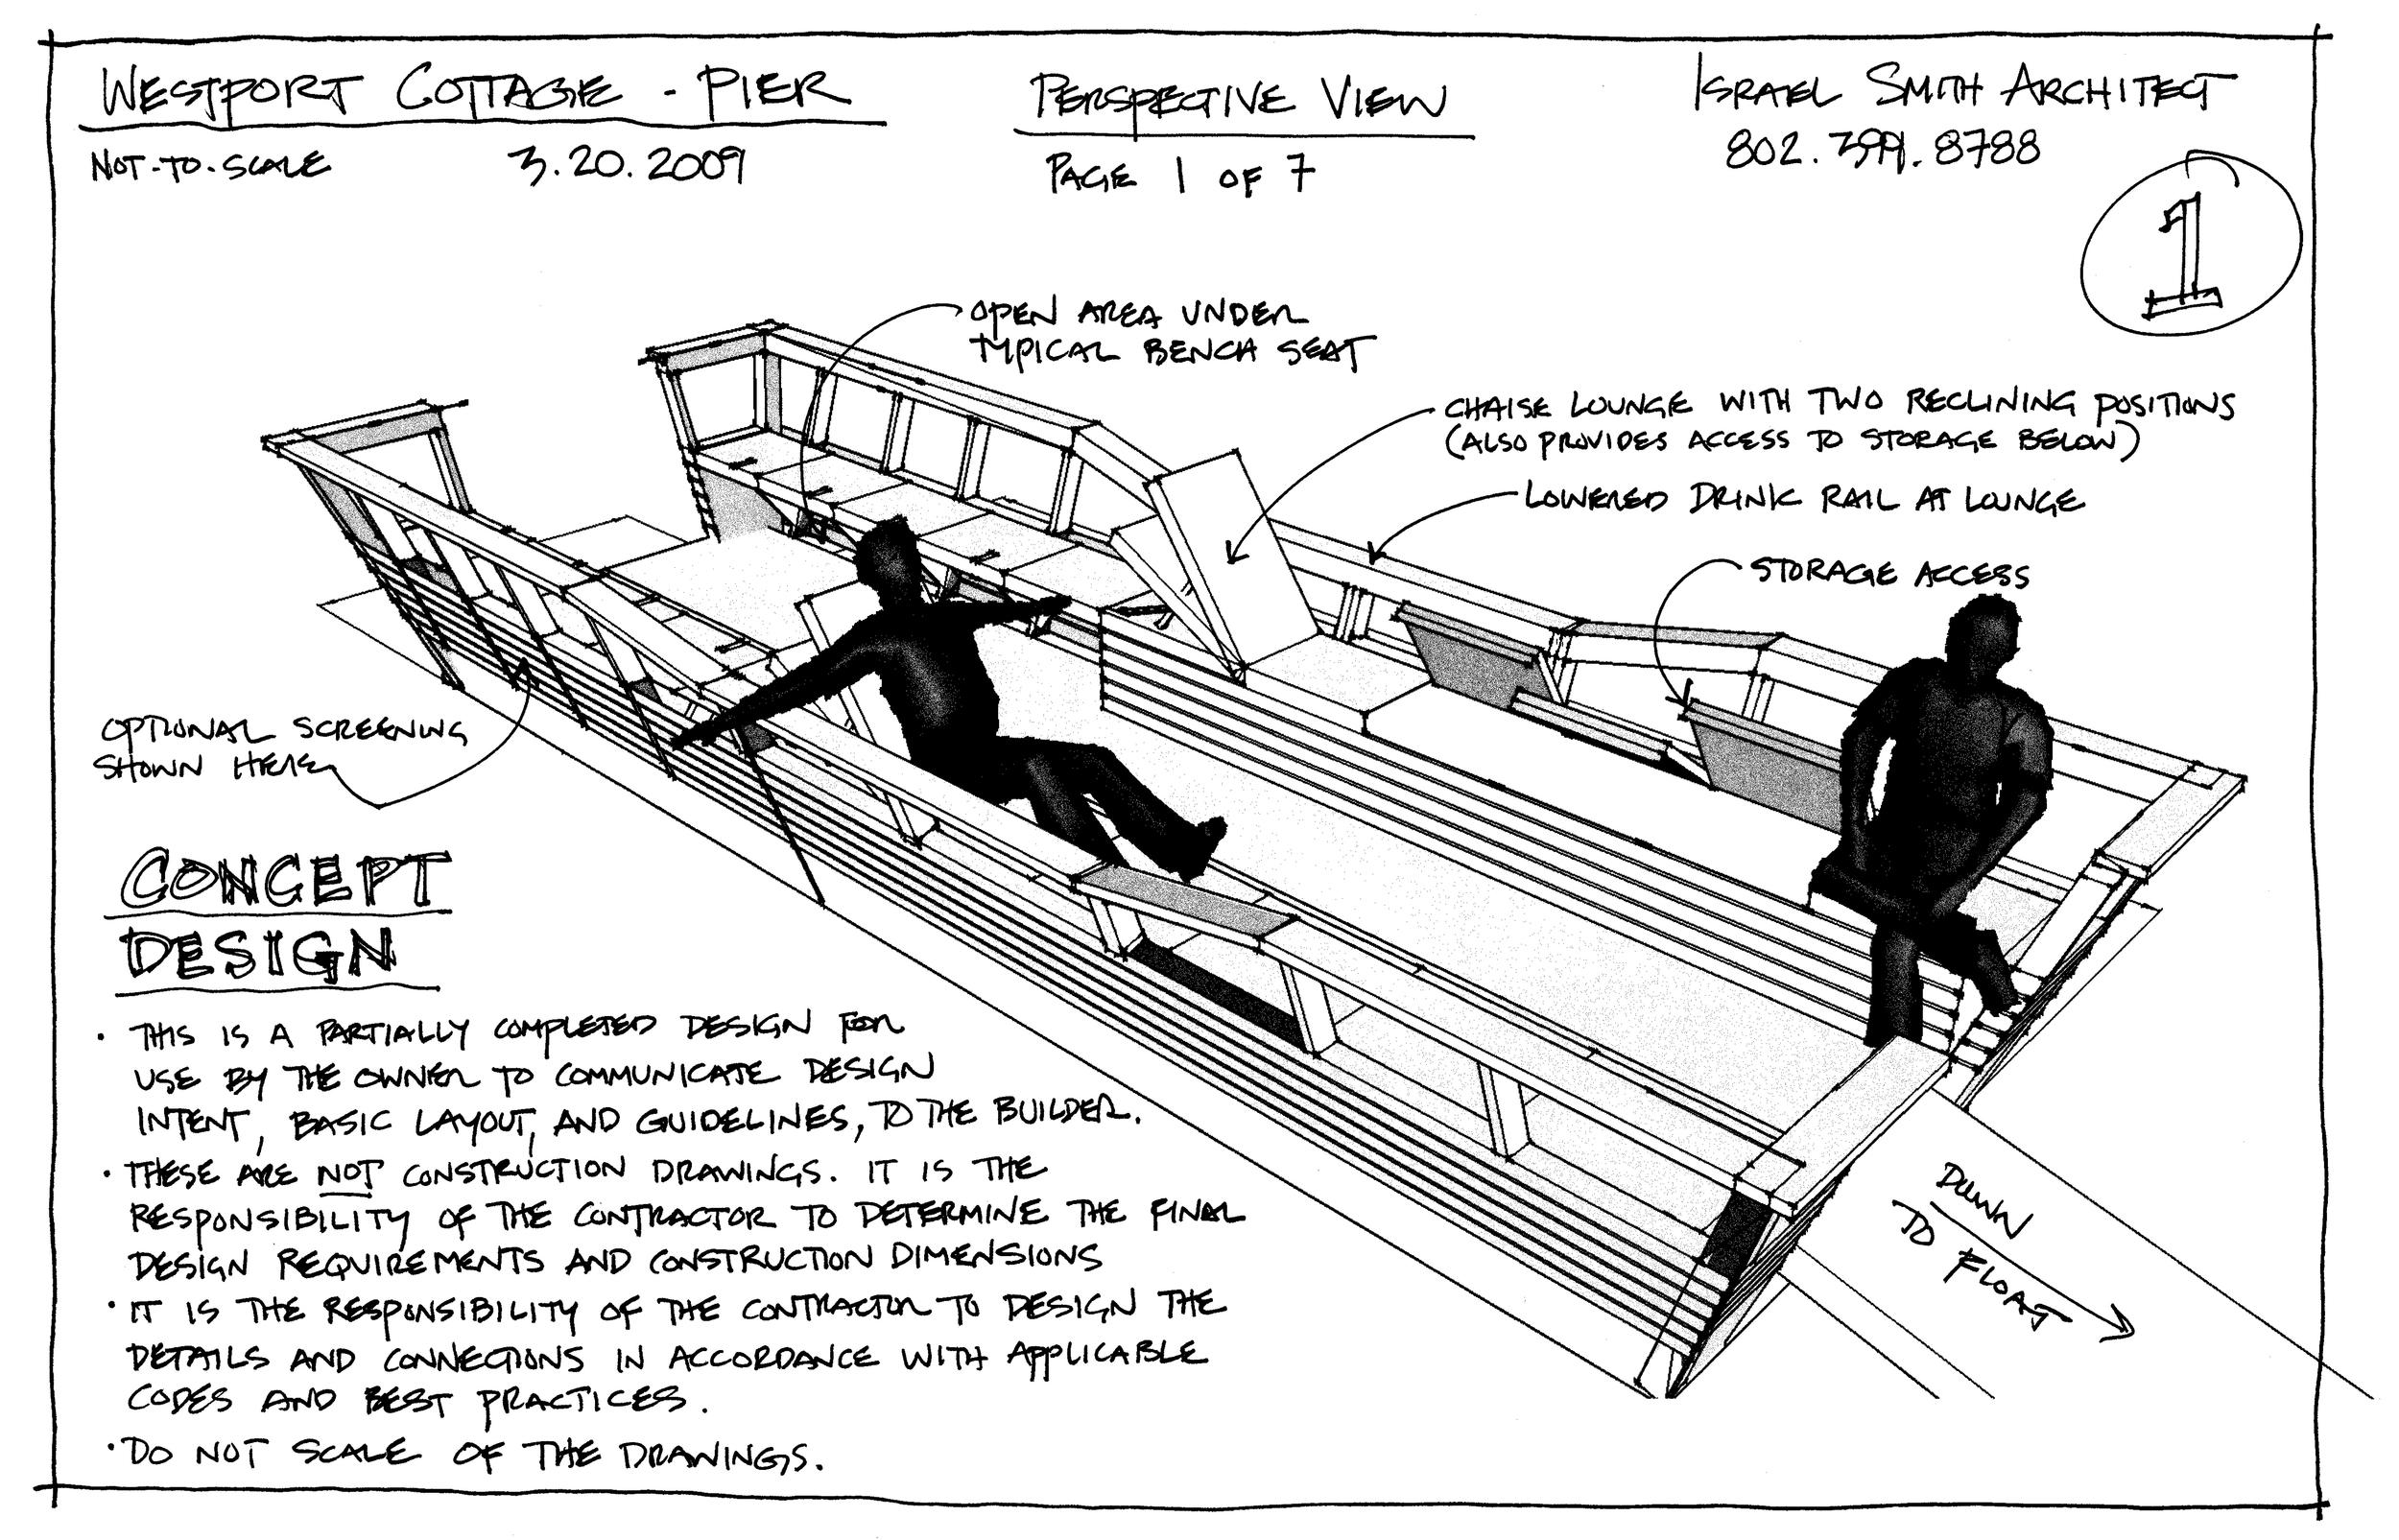 3D Concept sketch